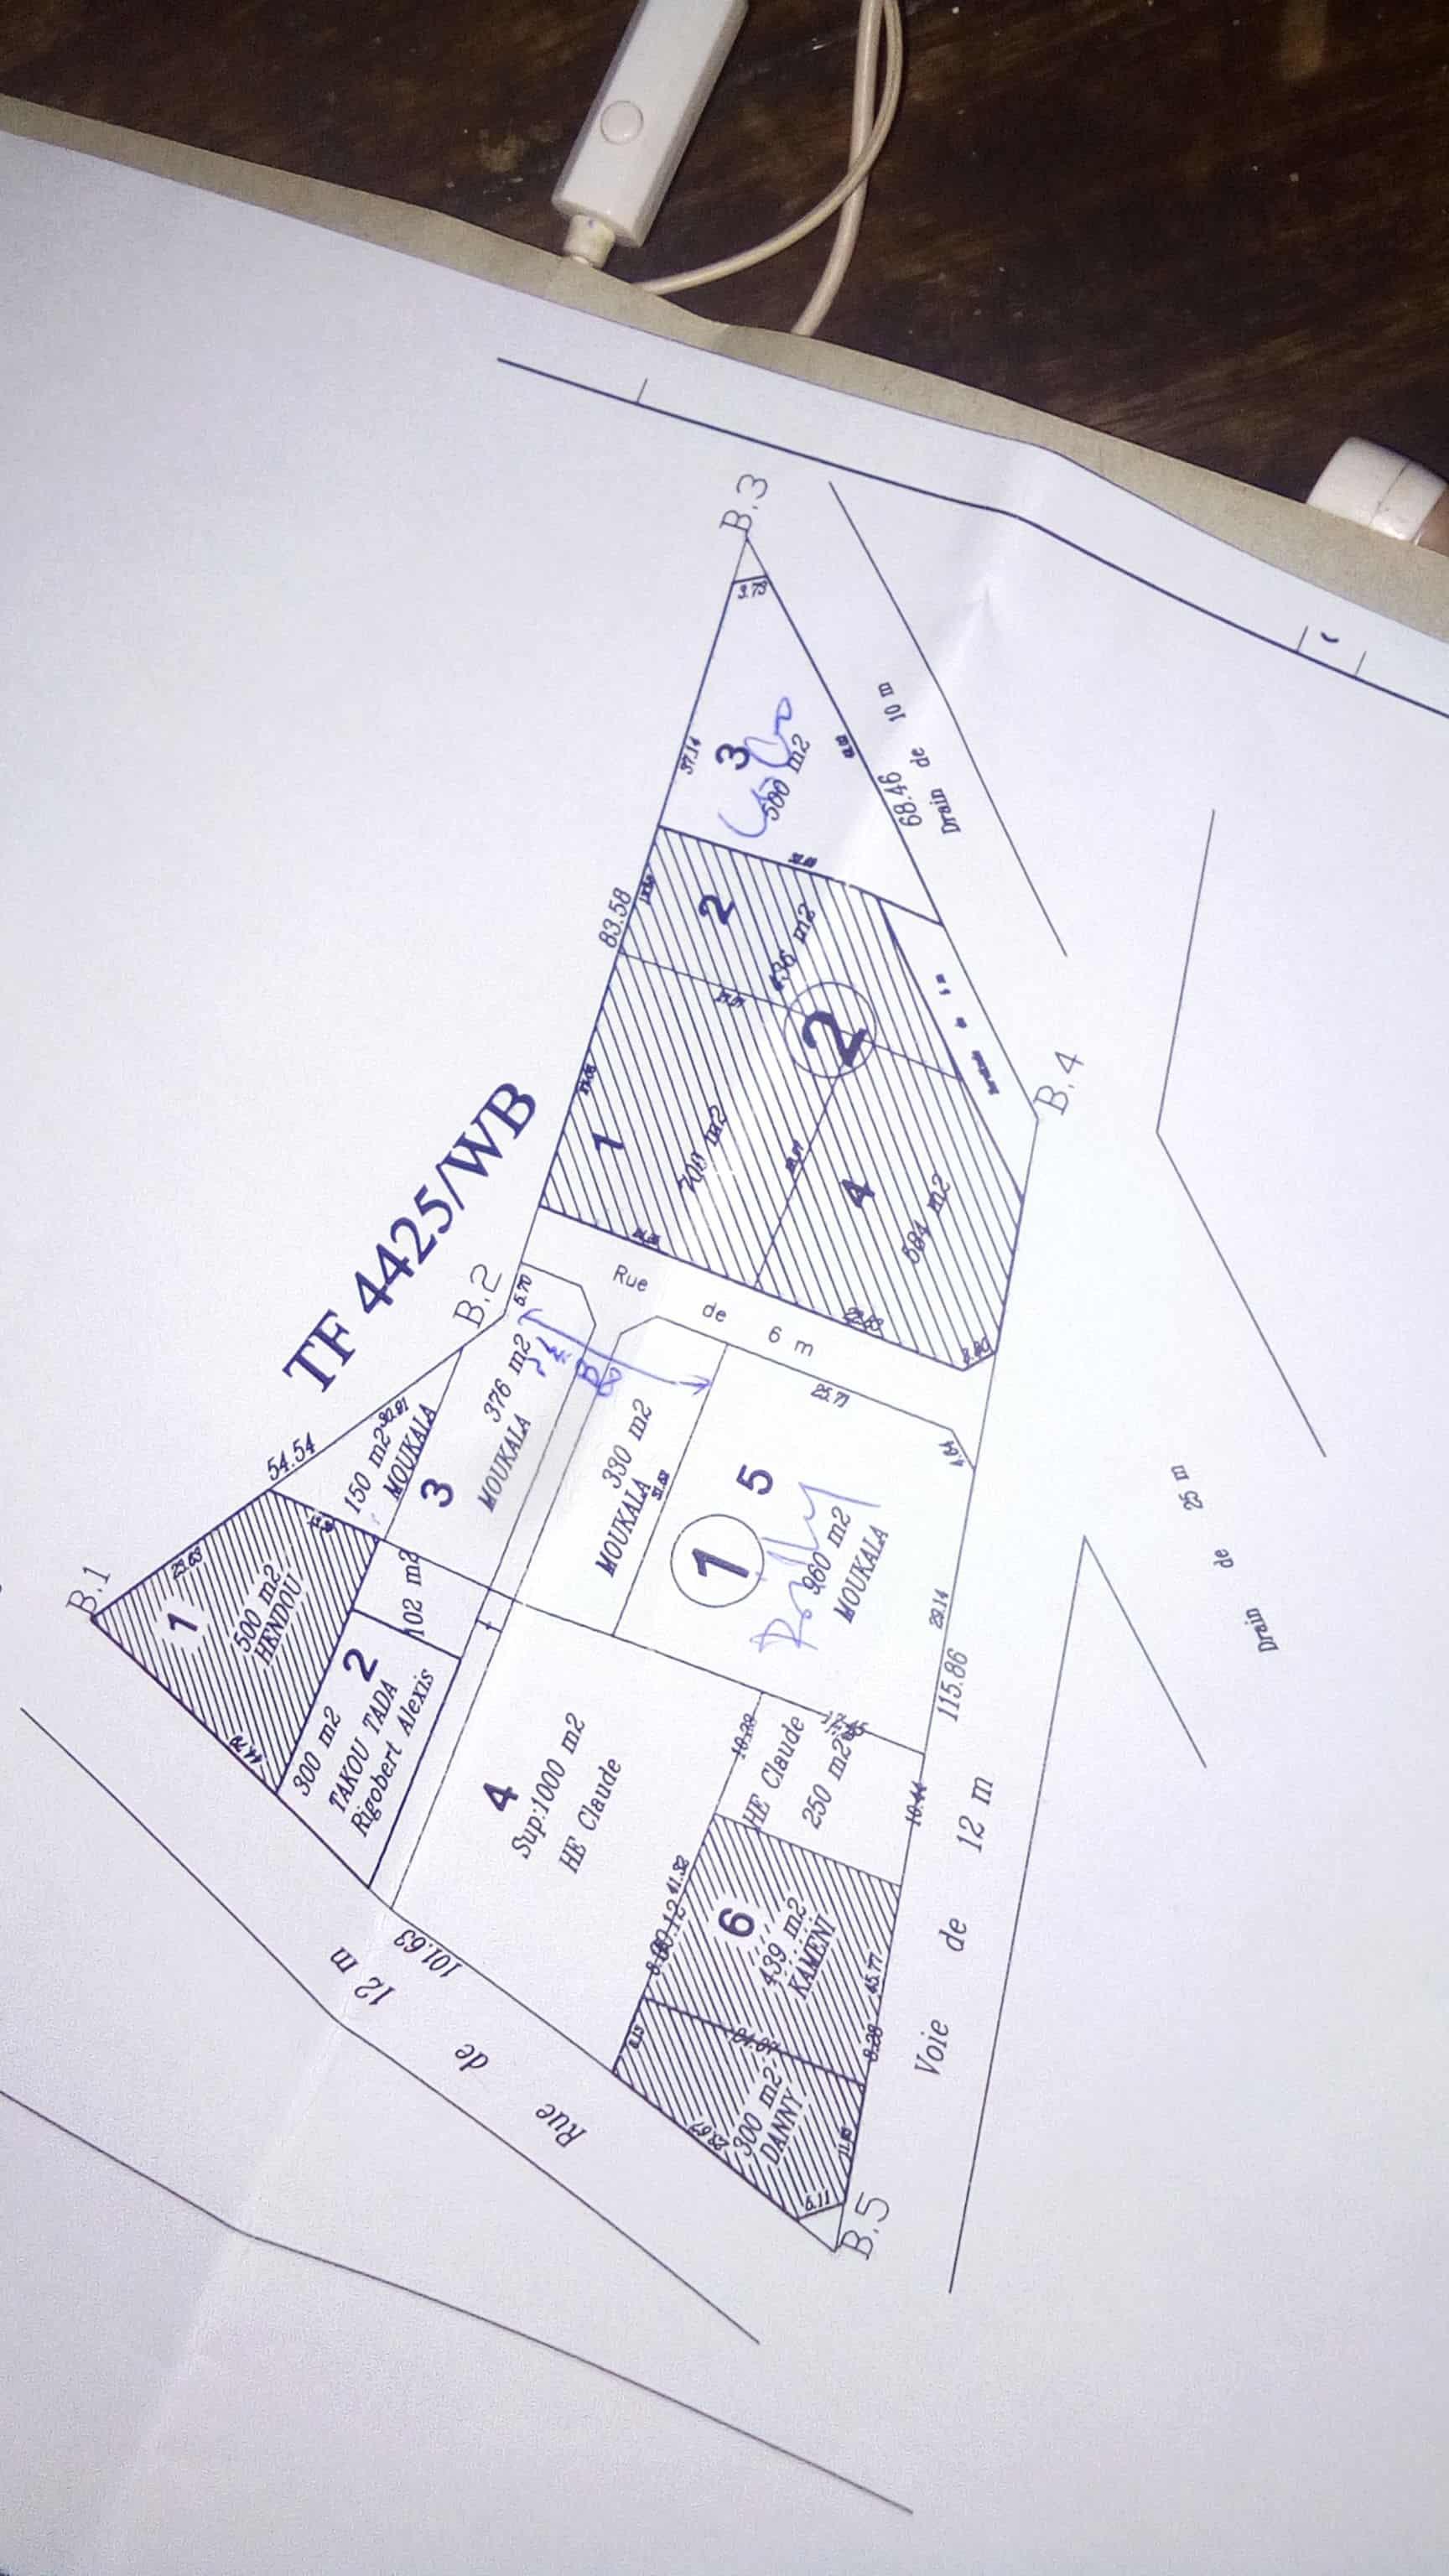 Terrain à vendre - Douala, Yassa, derrière le stade - 376 m2 - 5 640 000 FCFA